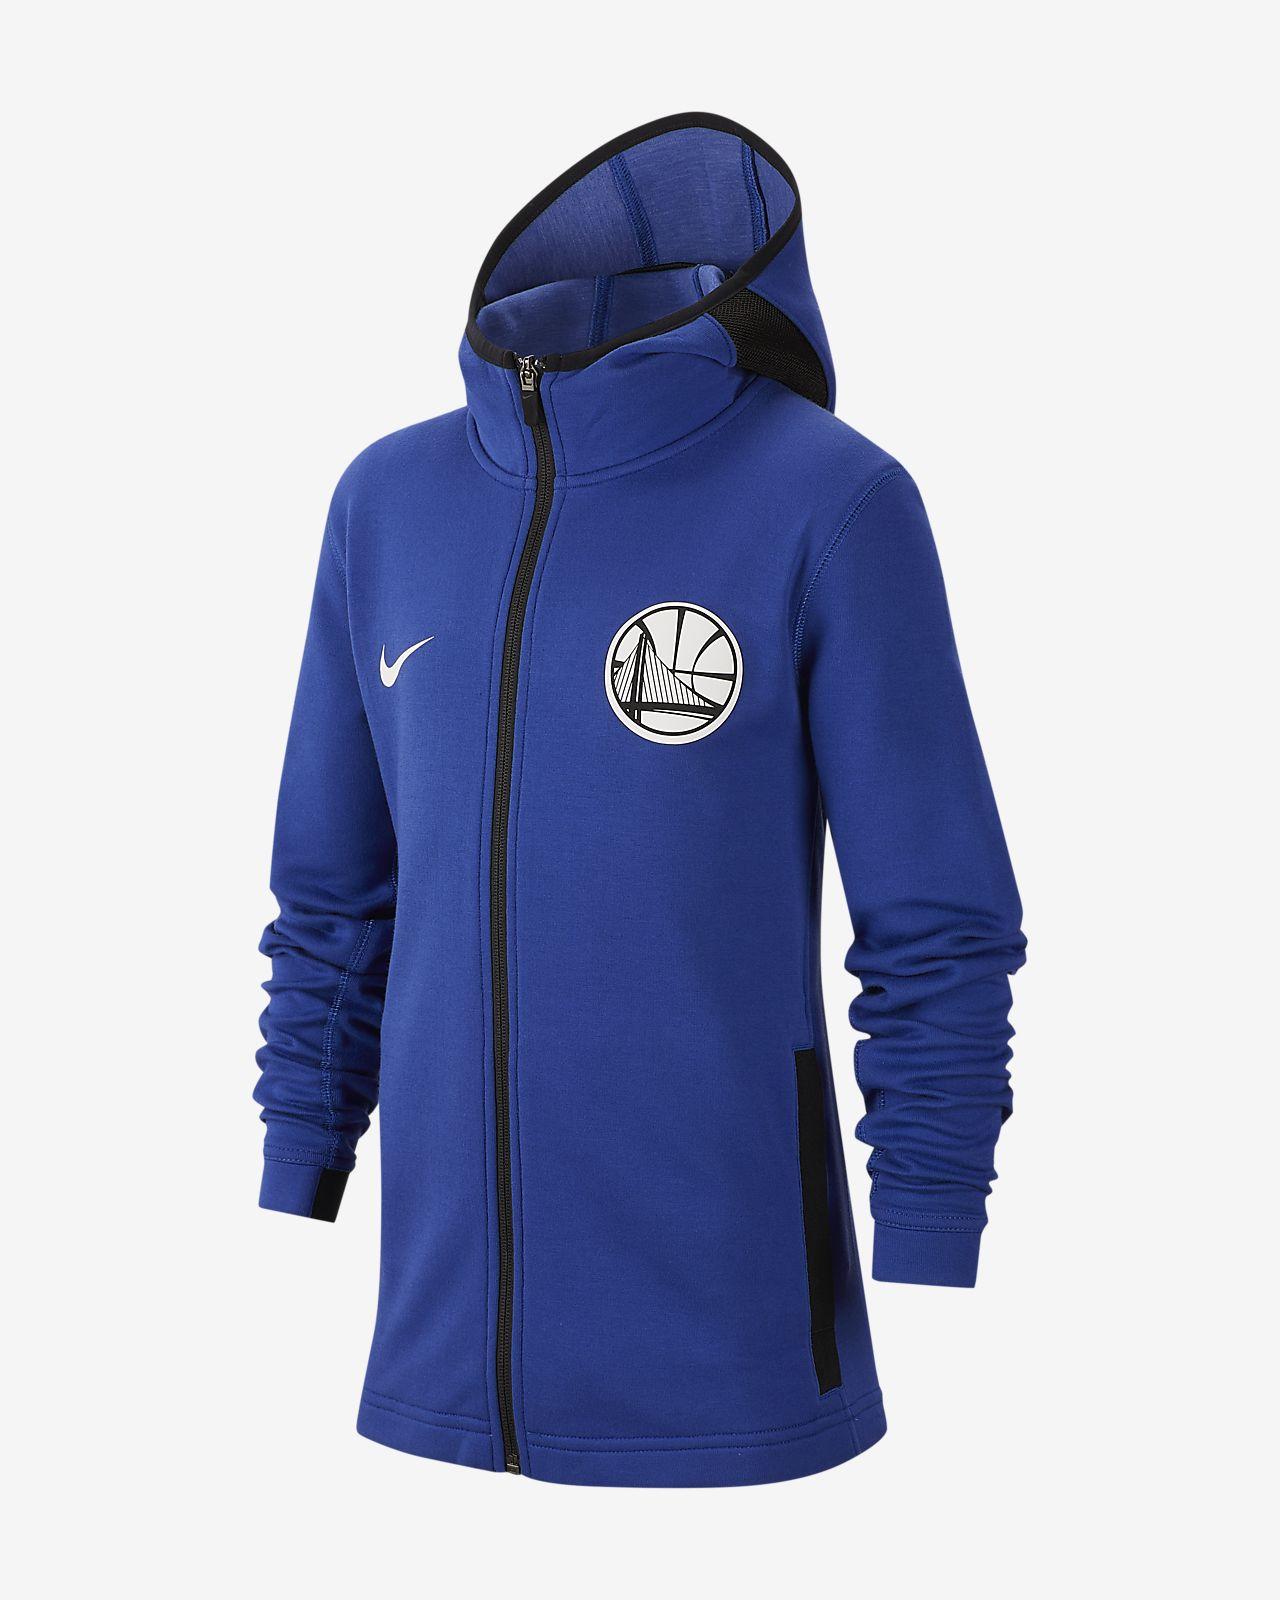 Golden State Warriors Nike Dri-FIT Showtime Big Kids  (Boys ) NBA ... 6af6375abd